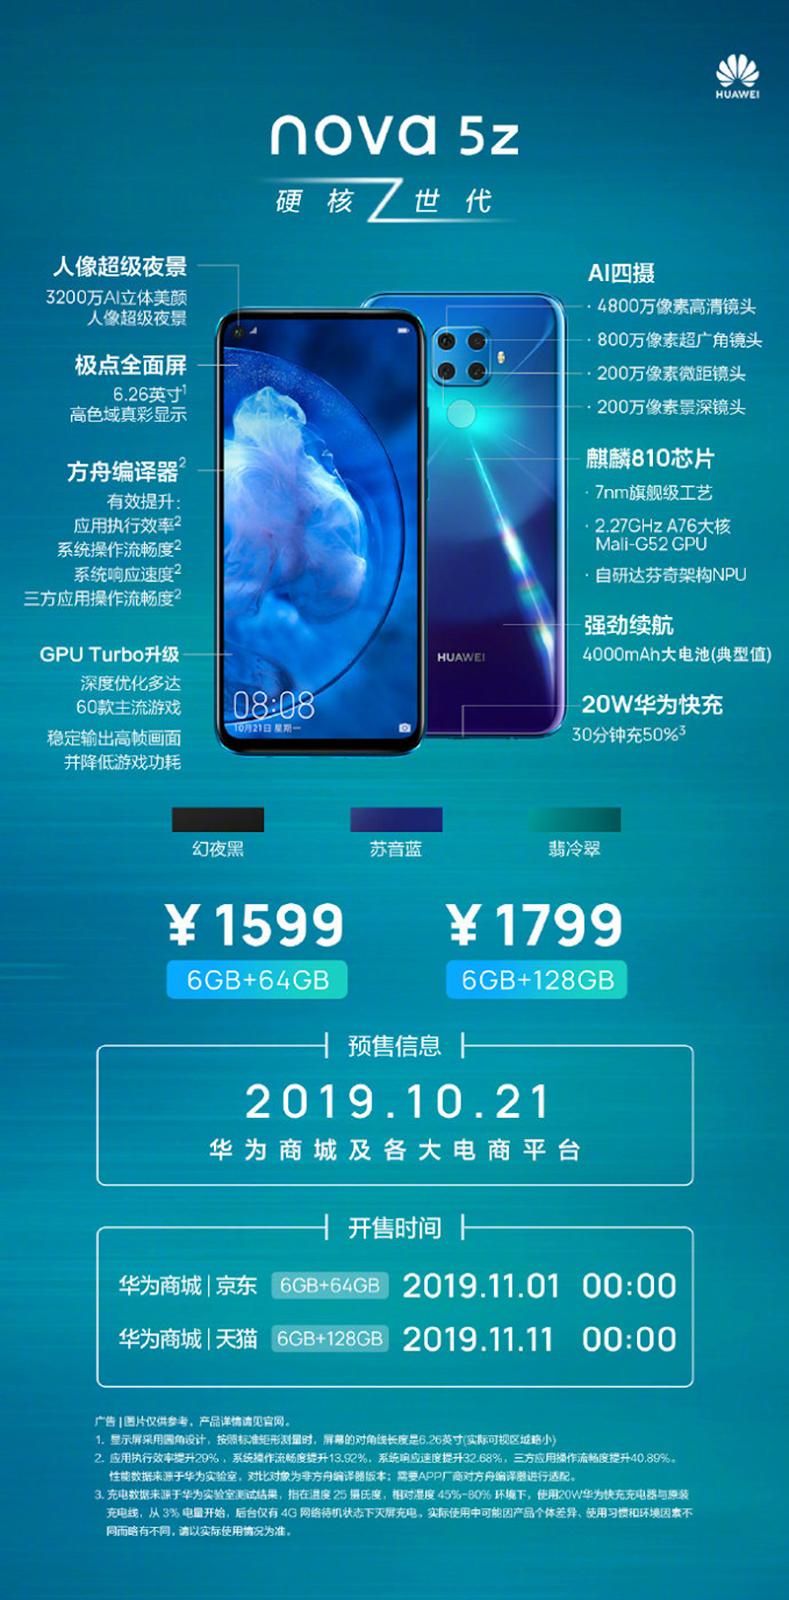 Highlights of the Huawei Nova 5z